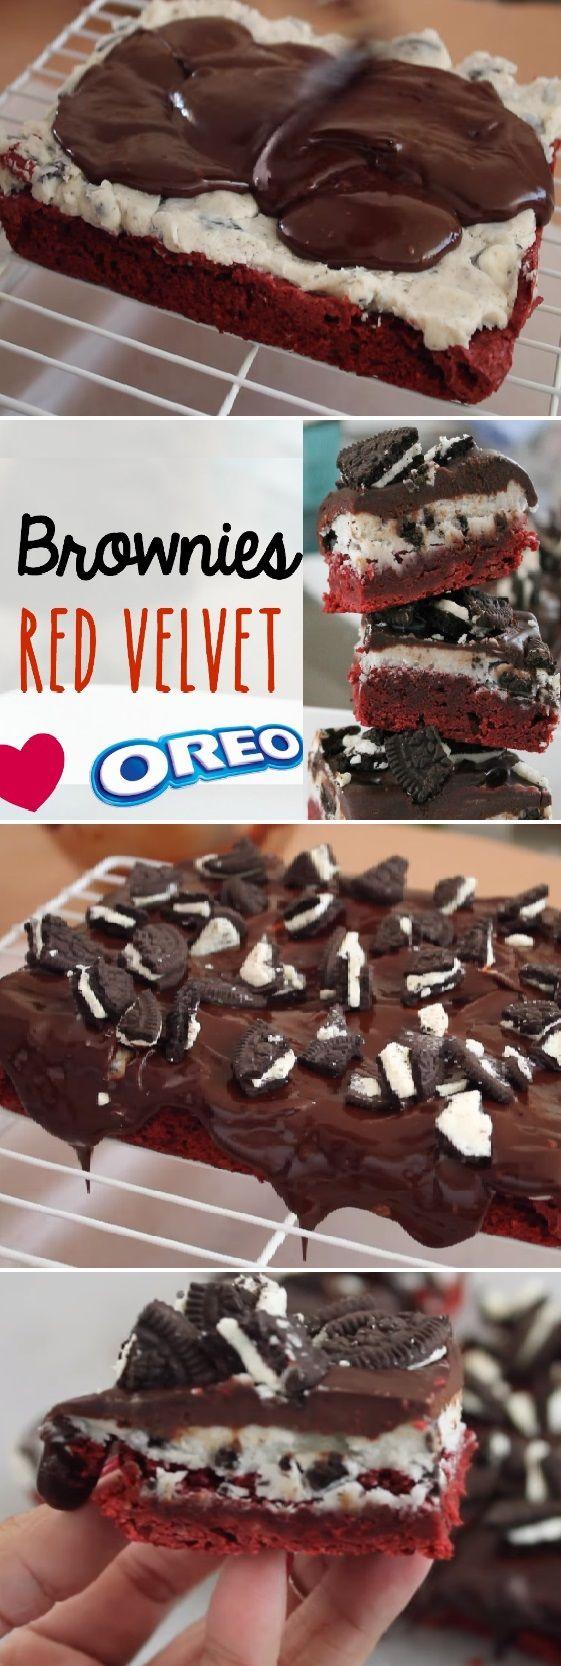 Brownies para San Valentín de Red Velvet y Oreo. Recetas Románticas...  #brownie #brownies #sanvalentin #valentinesday #valentine #love #azúcar #tips #cupcakes #cakes #dulces #receta #recipe #casero #torta #tartas #pastel #nestlecocina #bizcocho #bizcochuelo #tasty #cocina #chocolate #pan #panes  Si te gusta dinos HOLA y dale a Me Gusta MIREN …